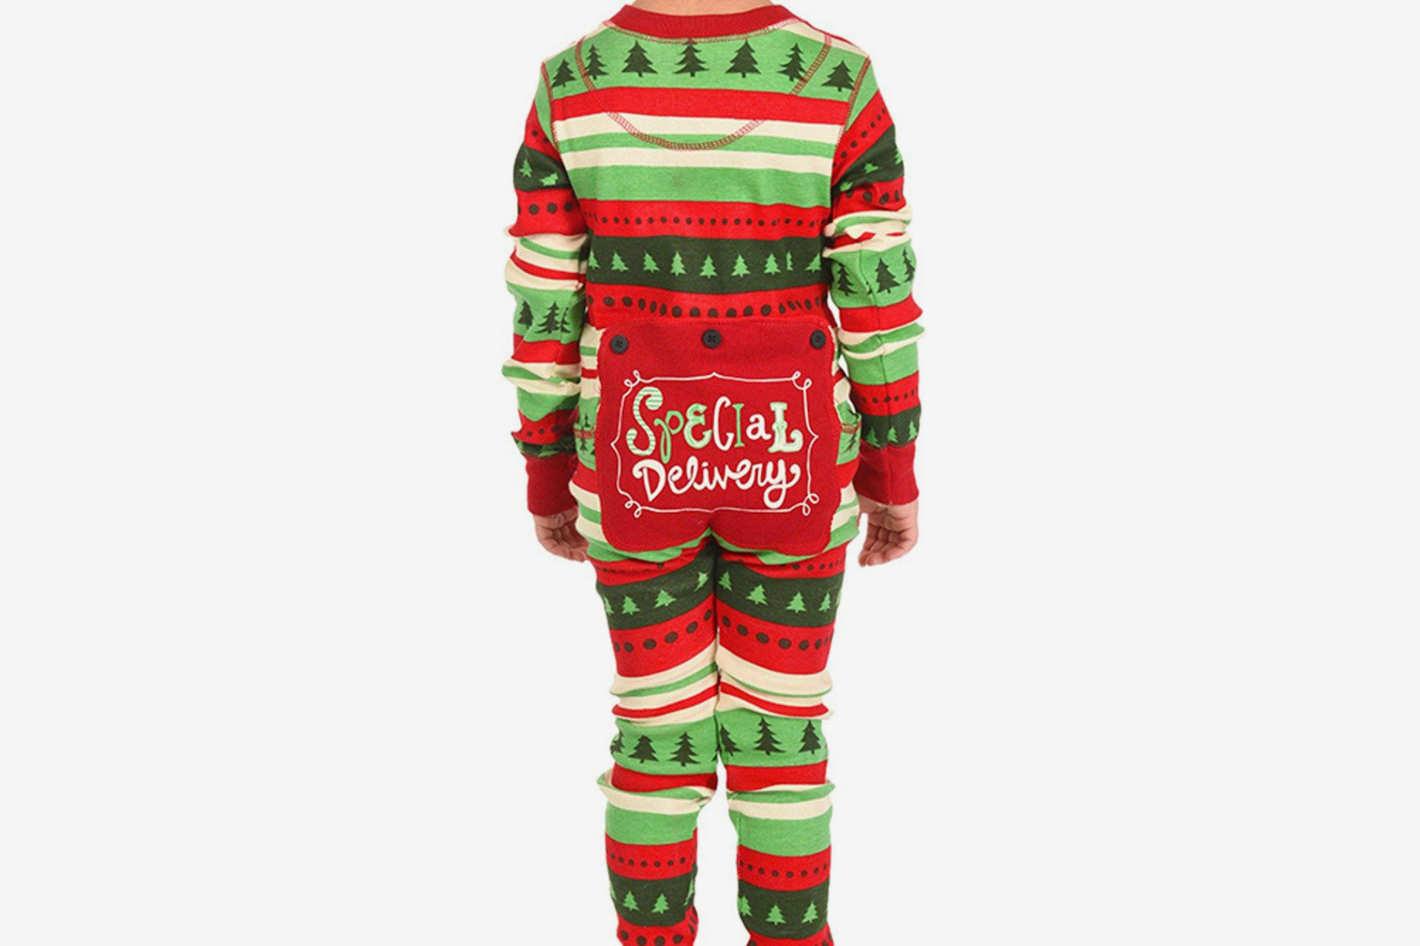 a2e9994a9eb6 16 Best Christmas Onesies 2018